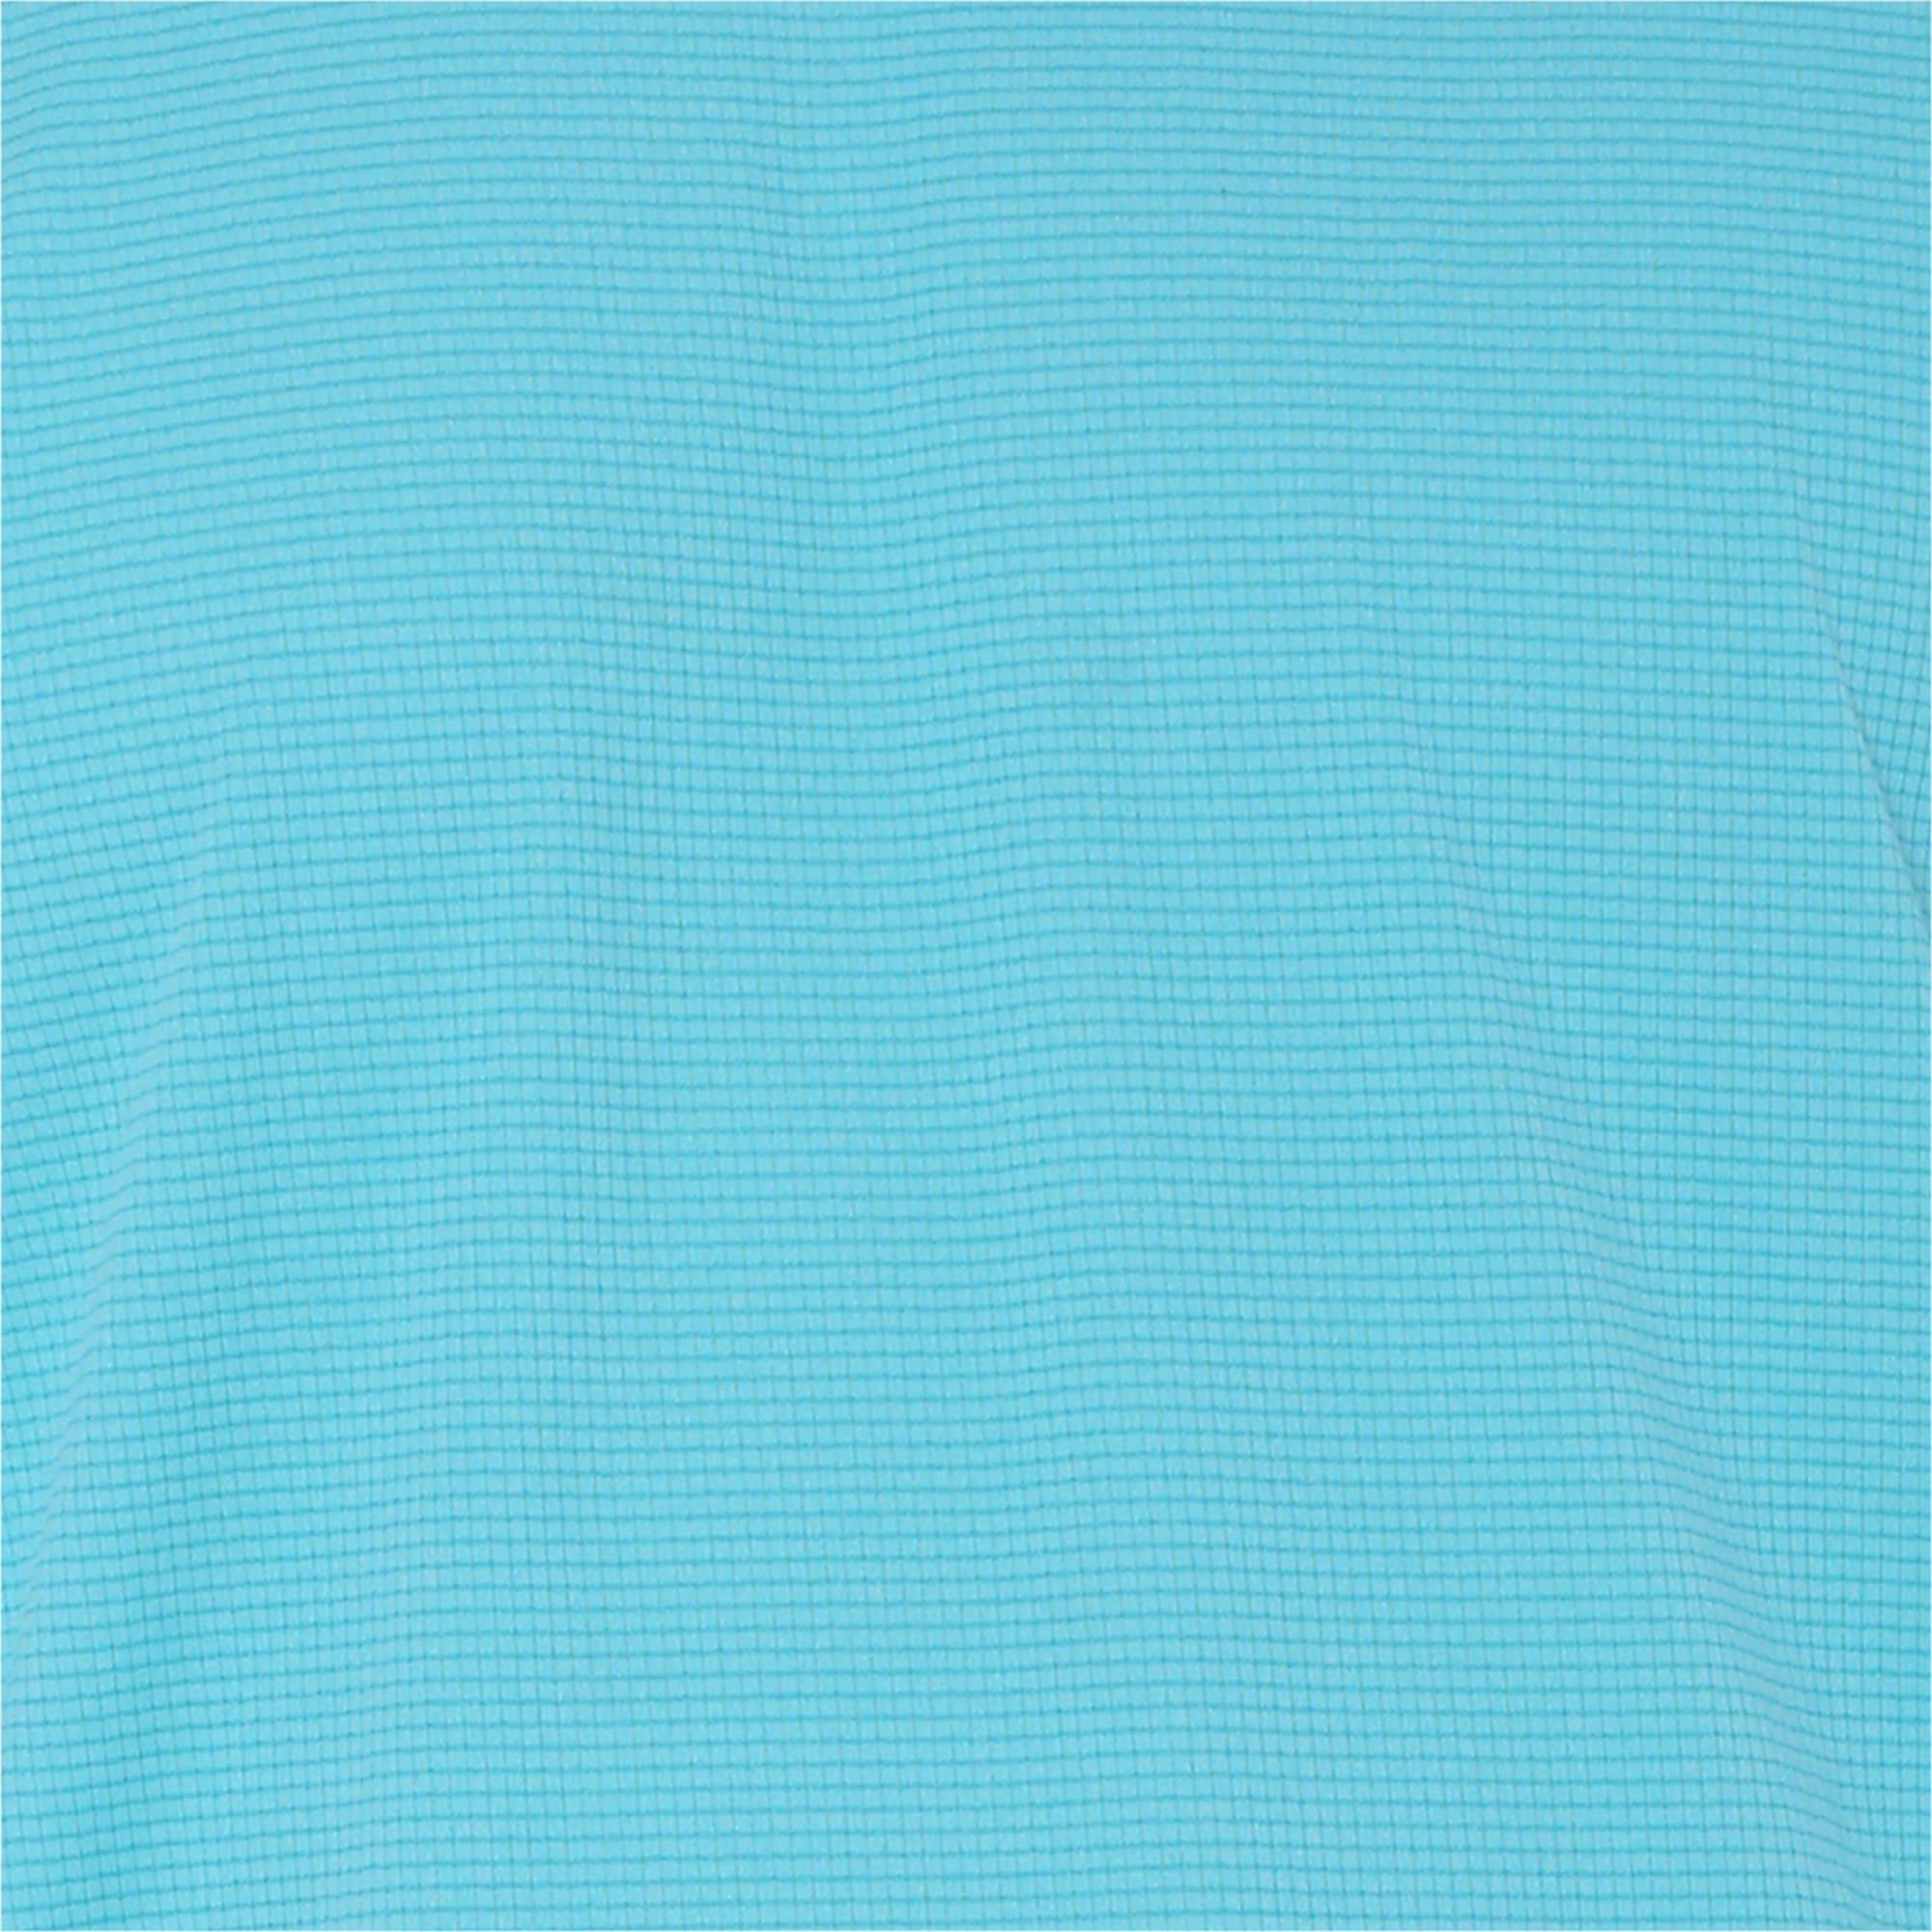 Thumbnail 6 of one8 VK Active Men's Singlet Tee, Blue Turquoise Heather, medium-IND